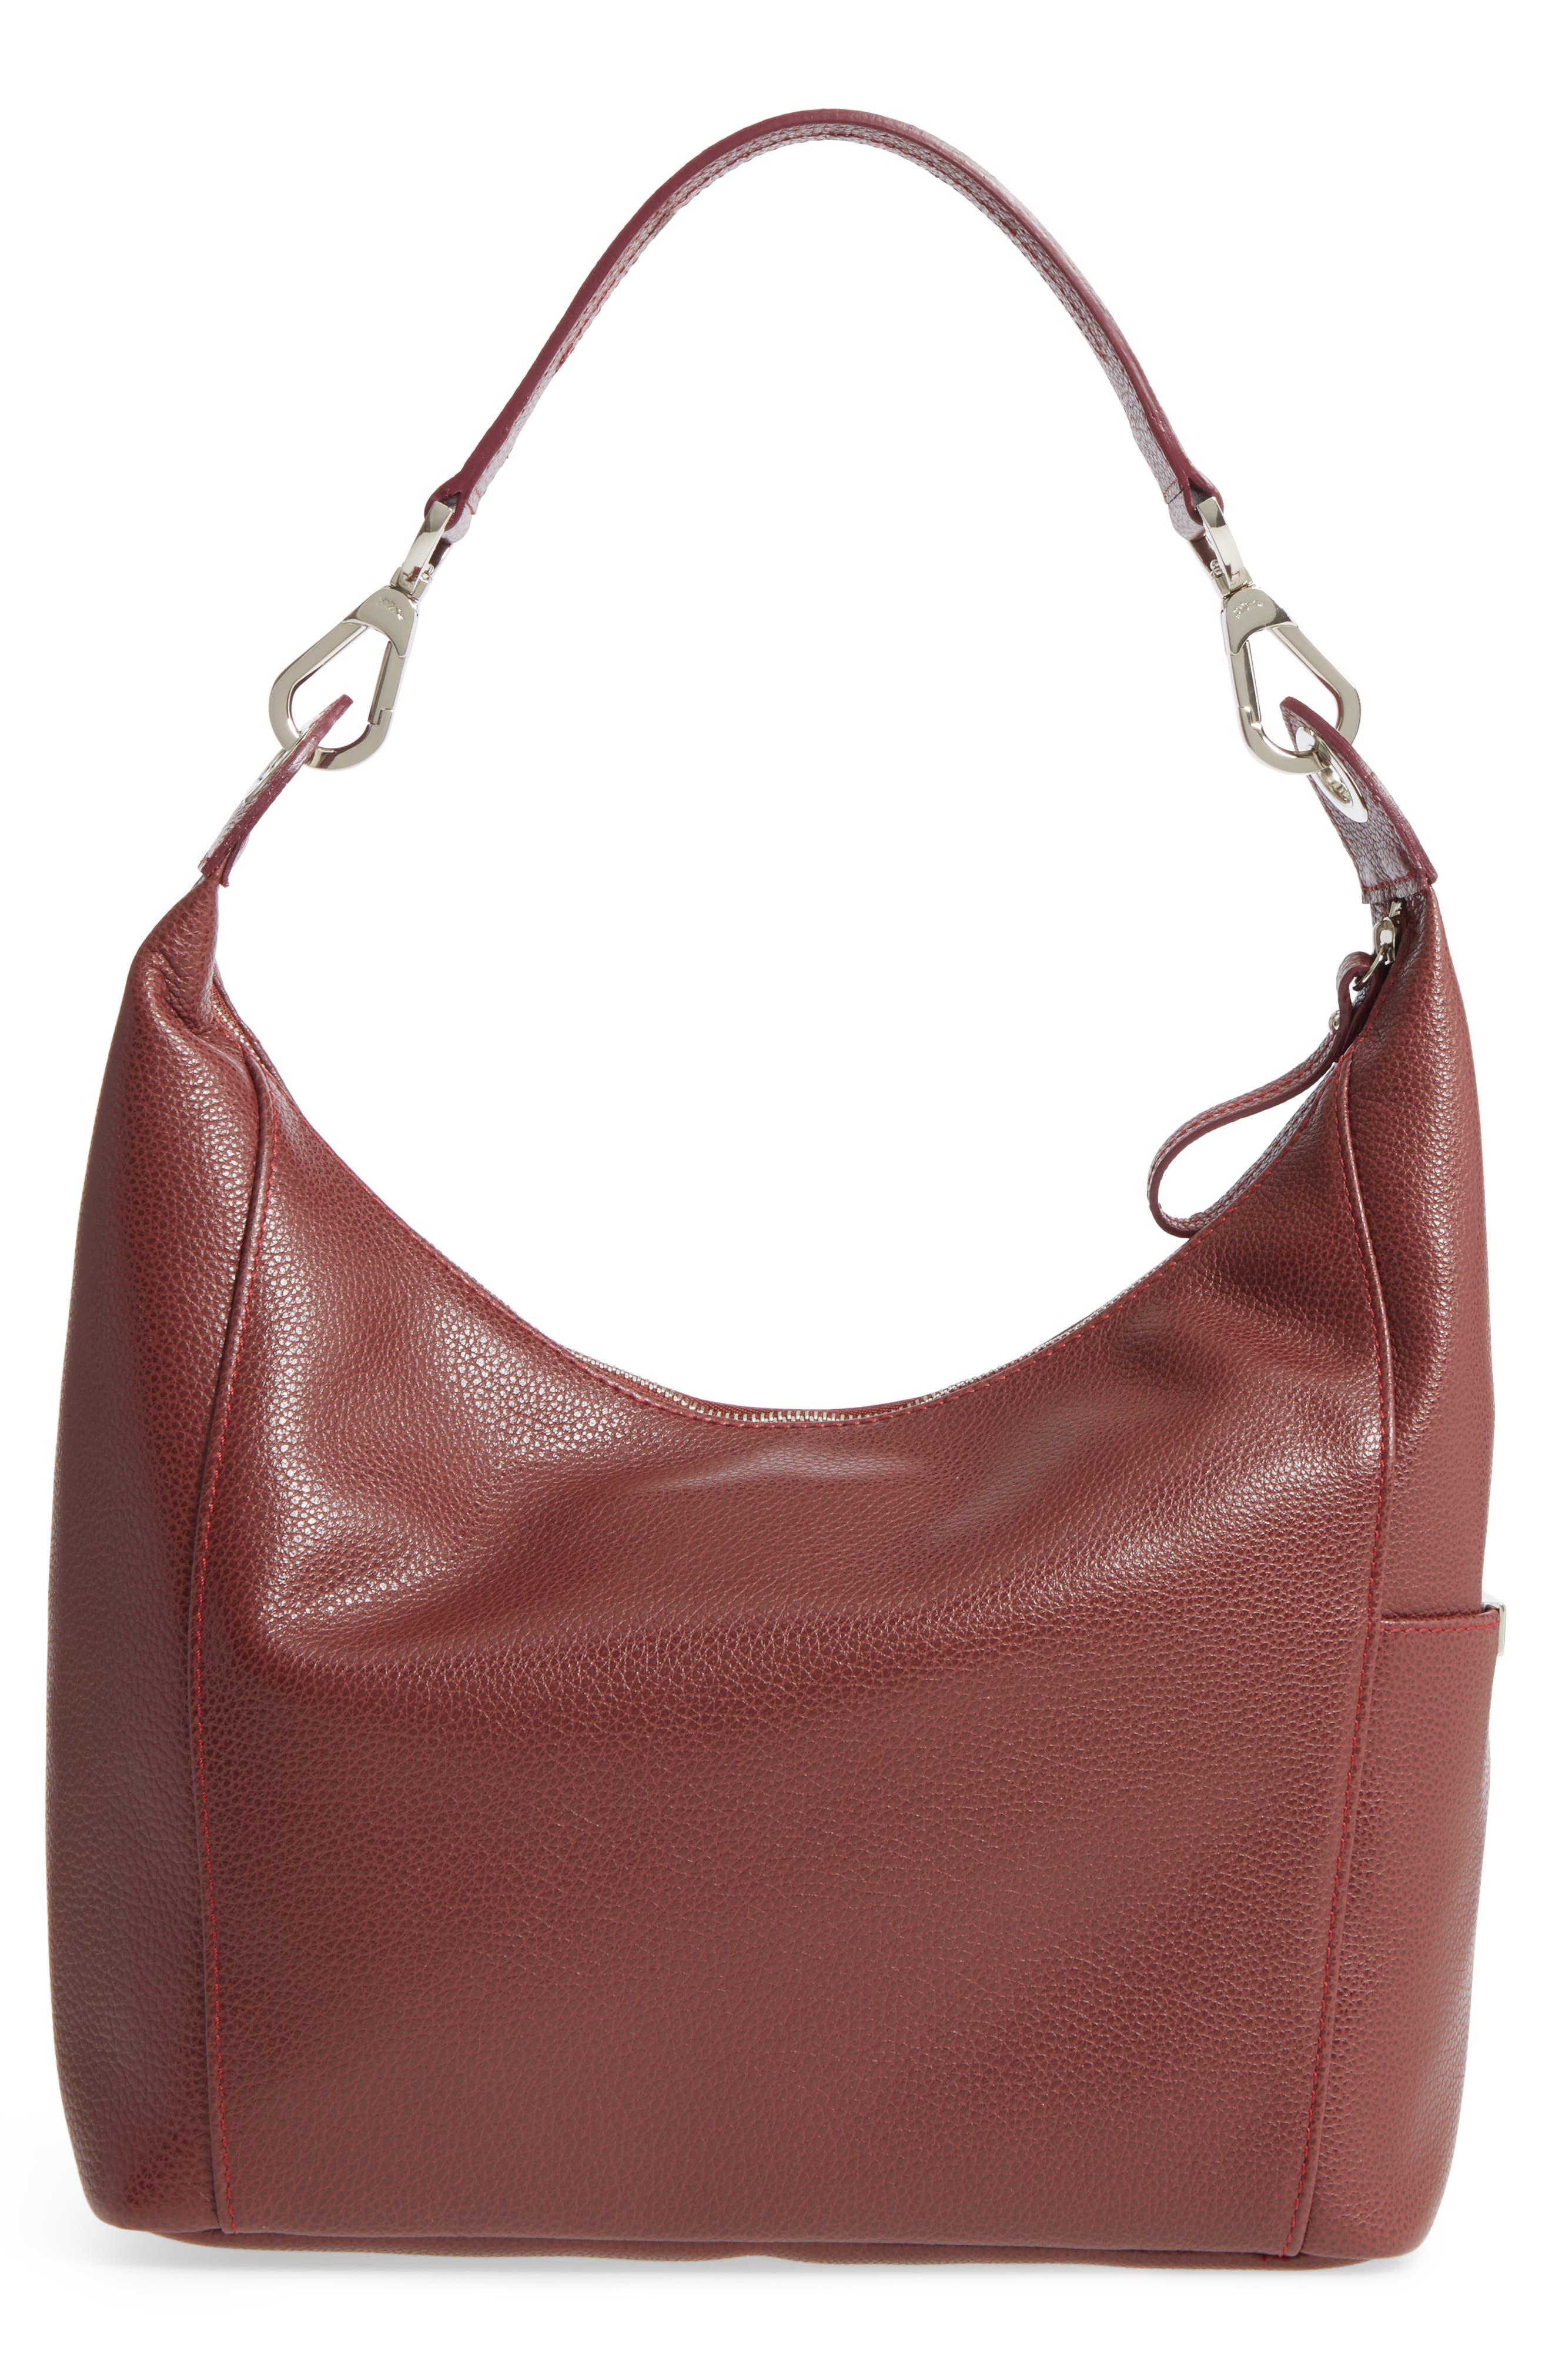 'Le Foulonne' Leather Hobo Bag,                             Alternate thumbnail 3, color,                             618